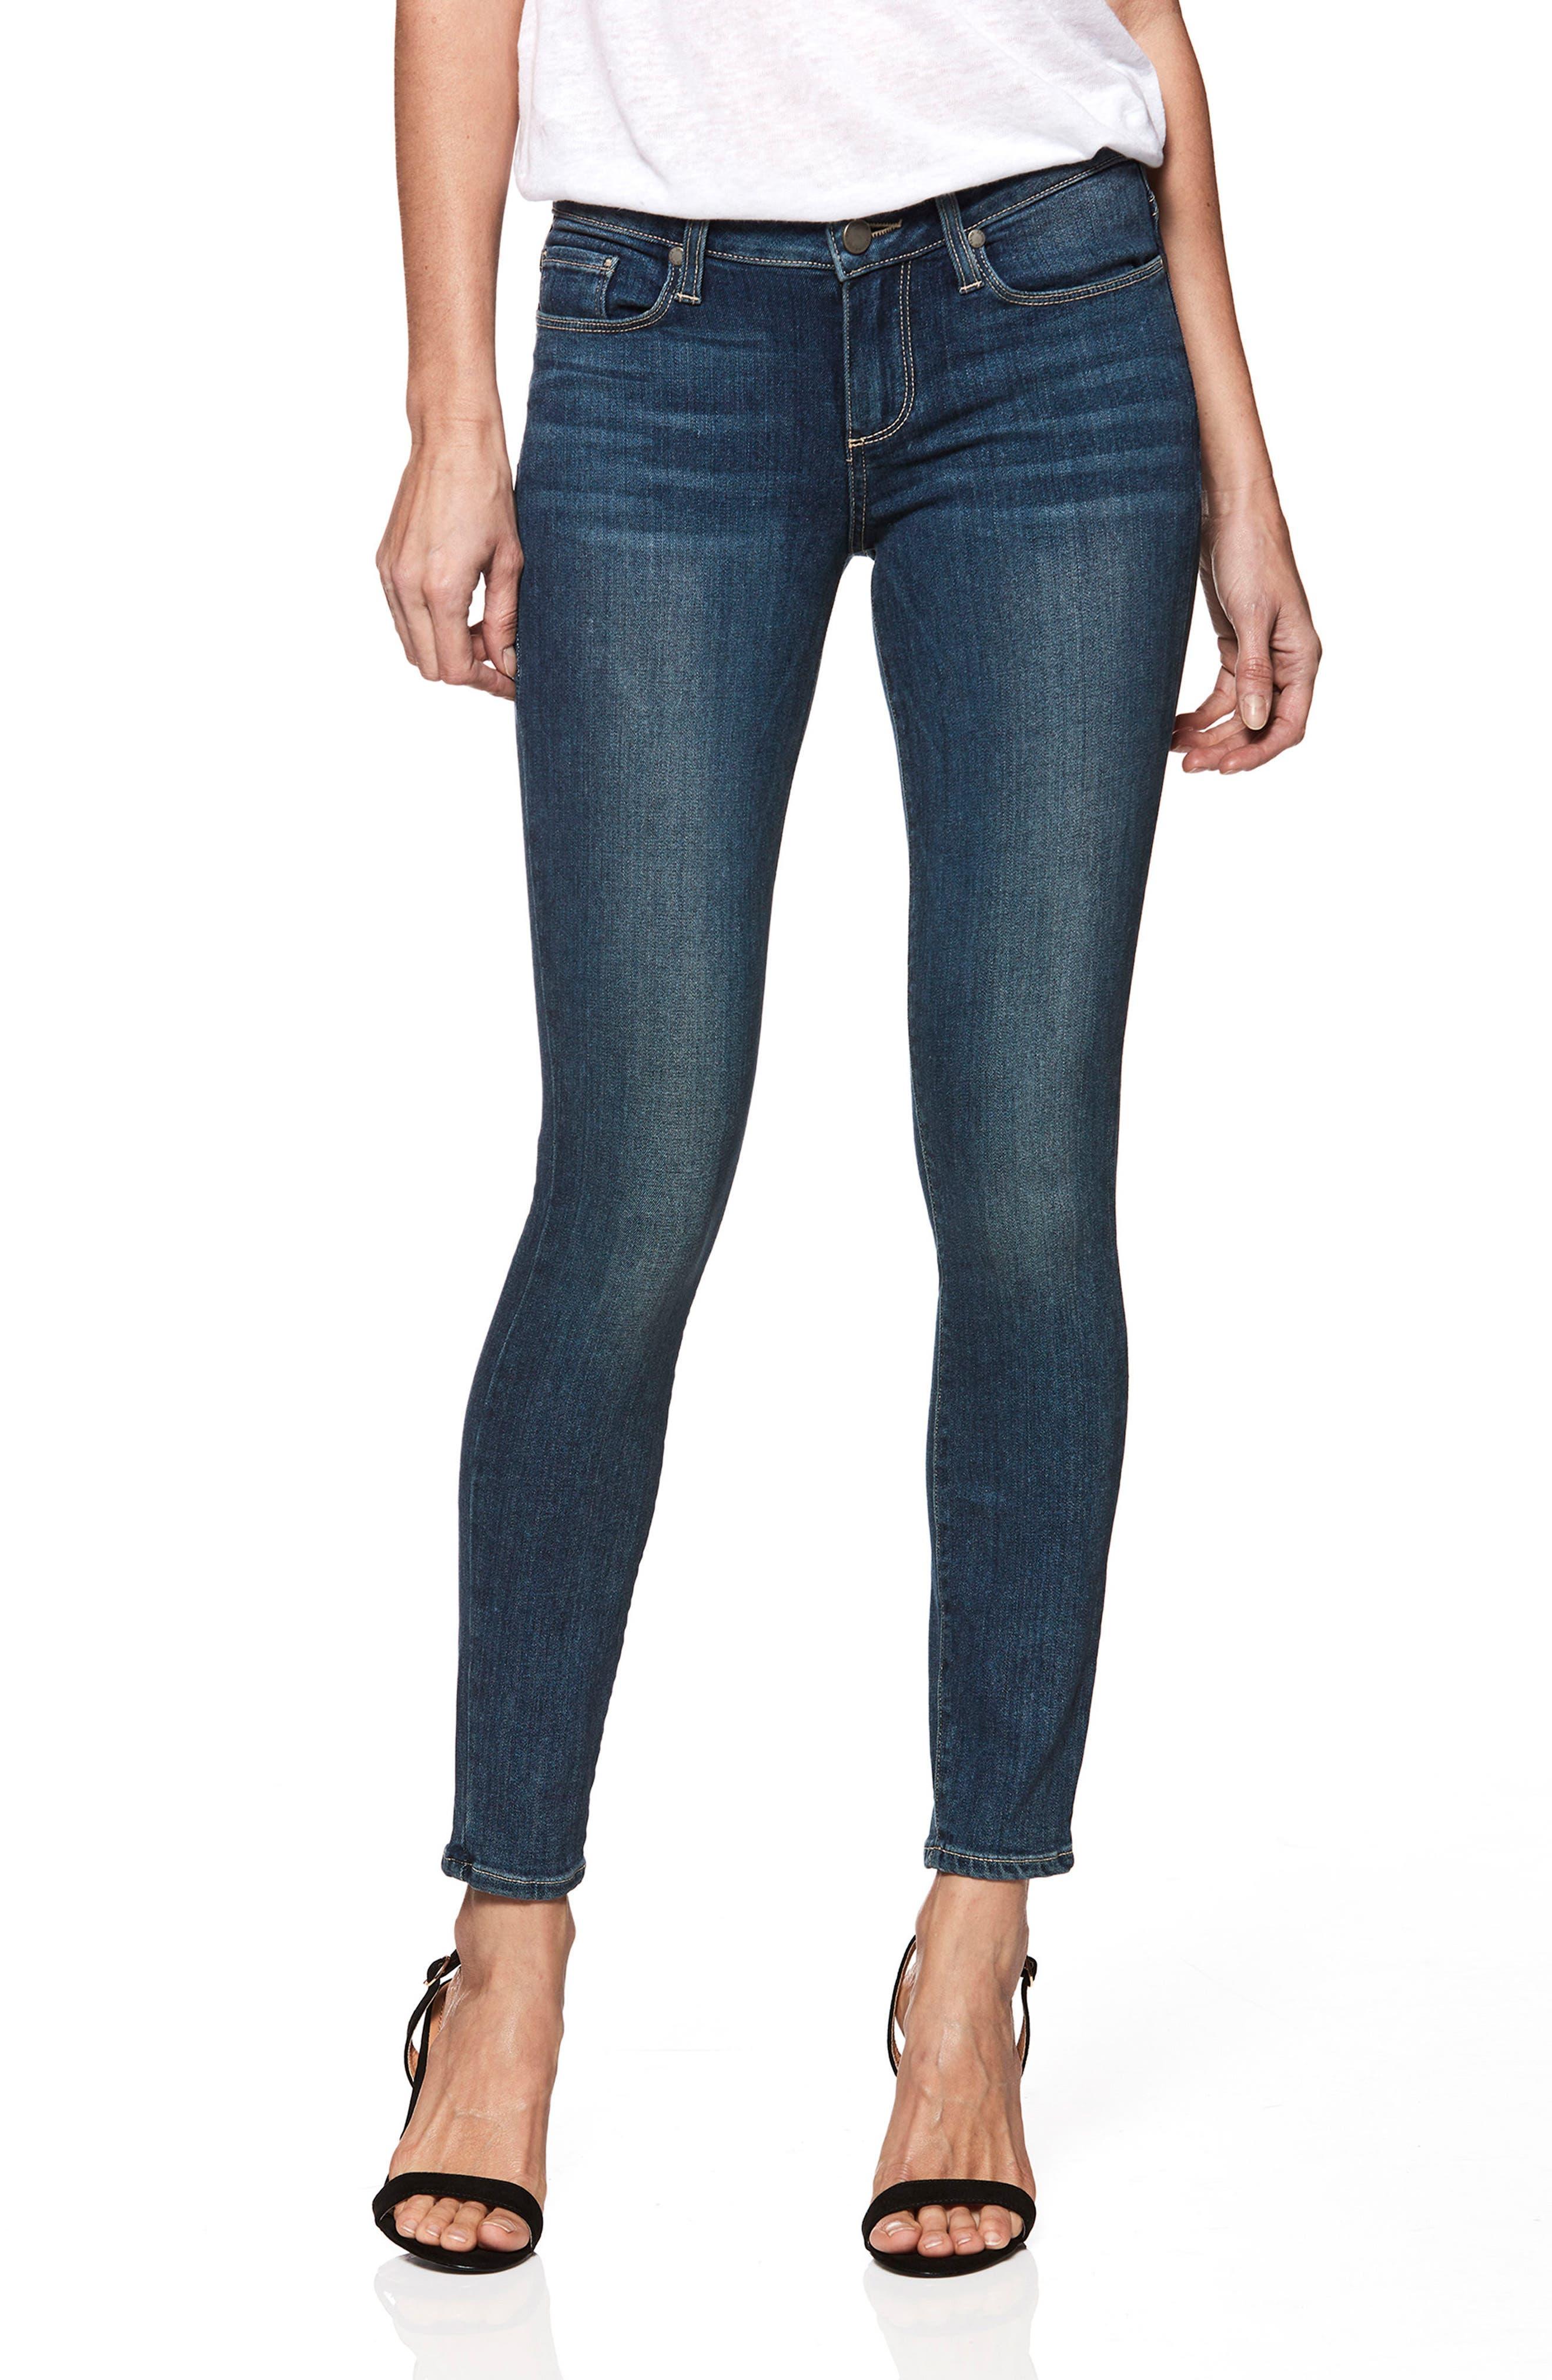 PAIGE Transcend - Verdugo Ankle Skinny Jeans (Romsey)